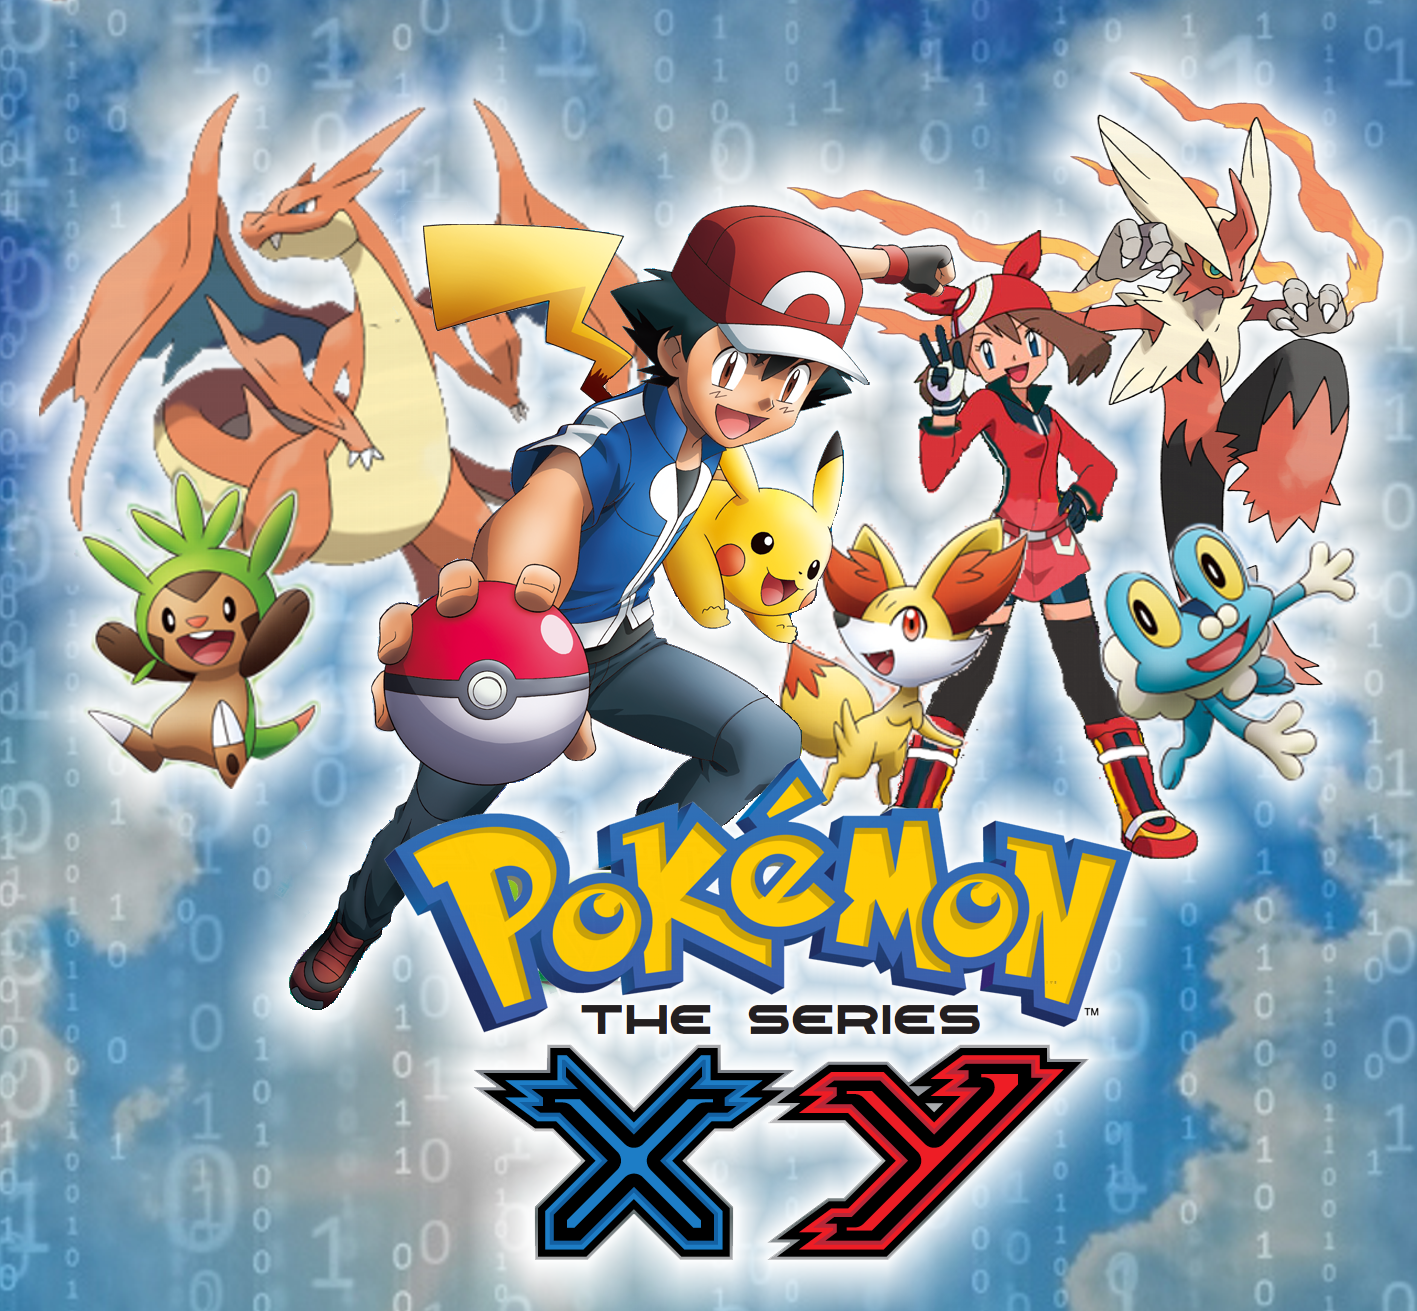 Pokemon Xy Eduardo Garza No Sera El Director Toontv Somos Tv